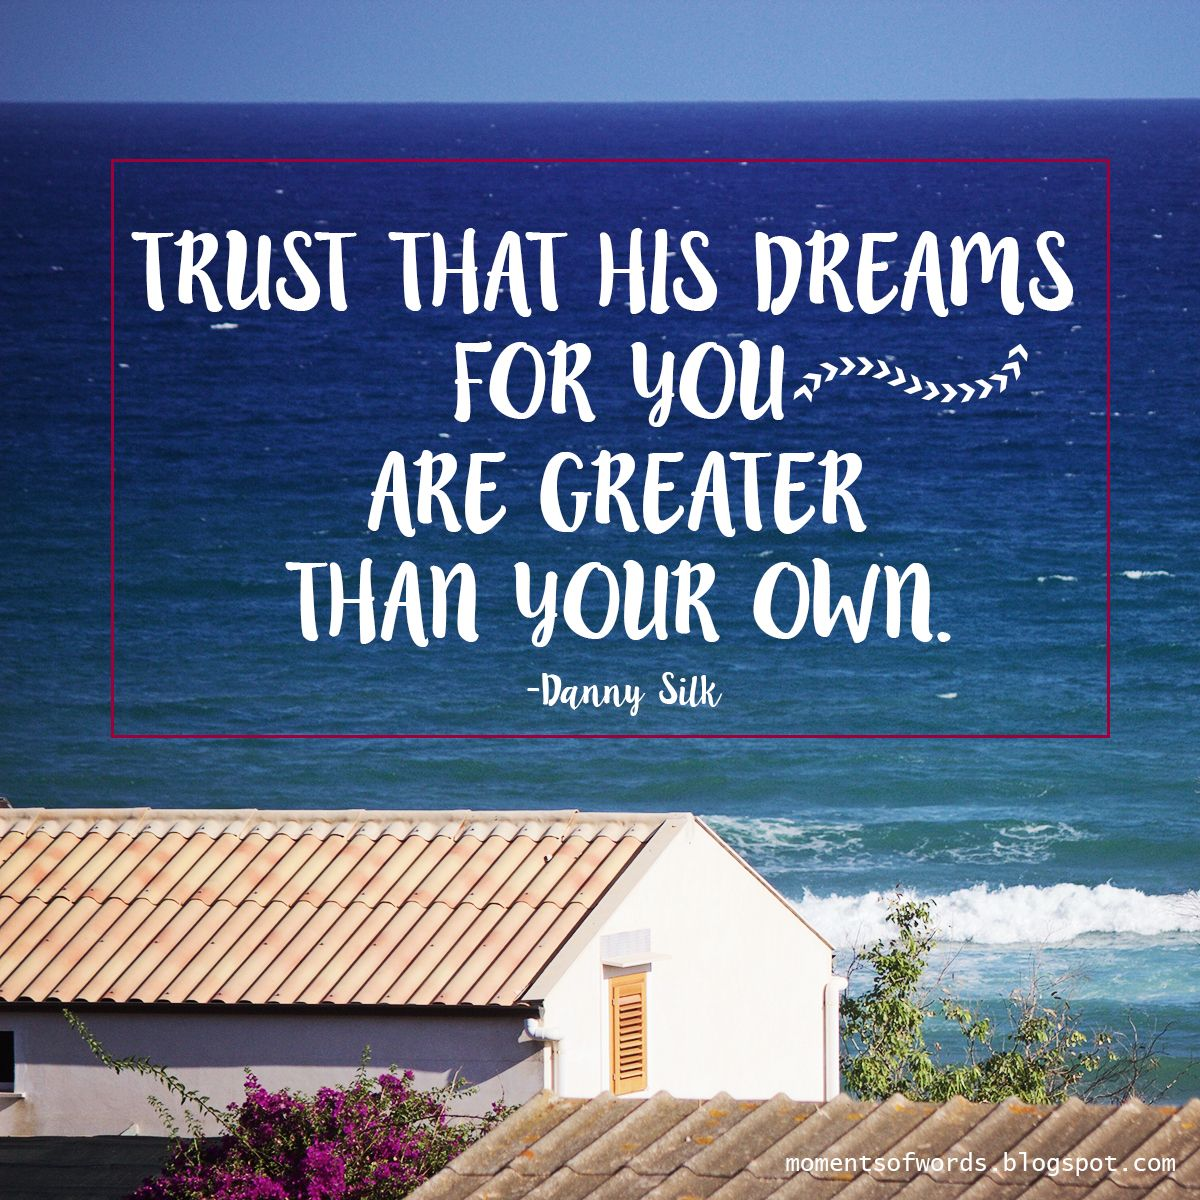 ♥ #dream #trustgod #godsdream #encouragement #wisewords